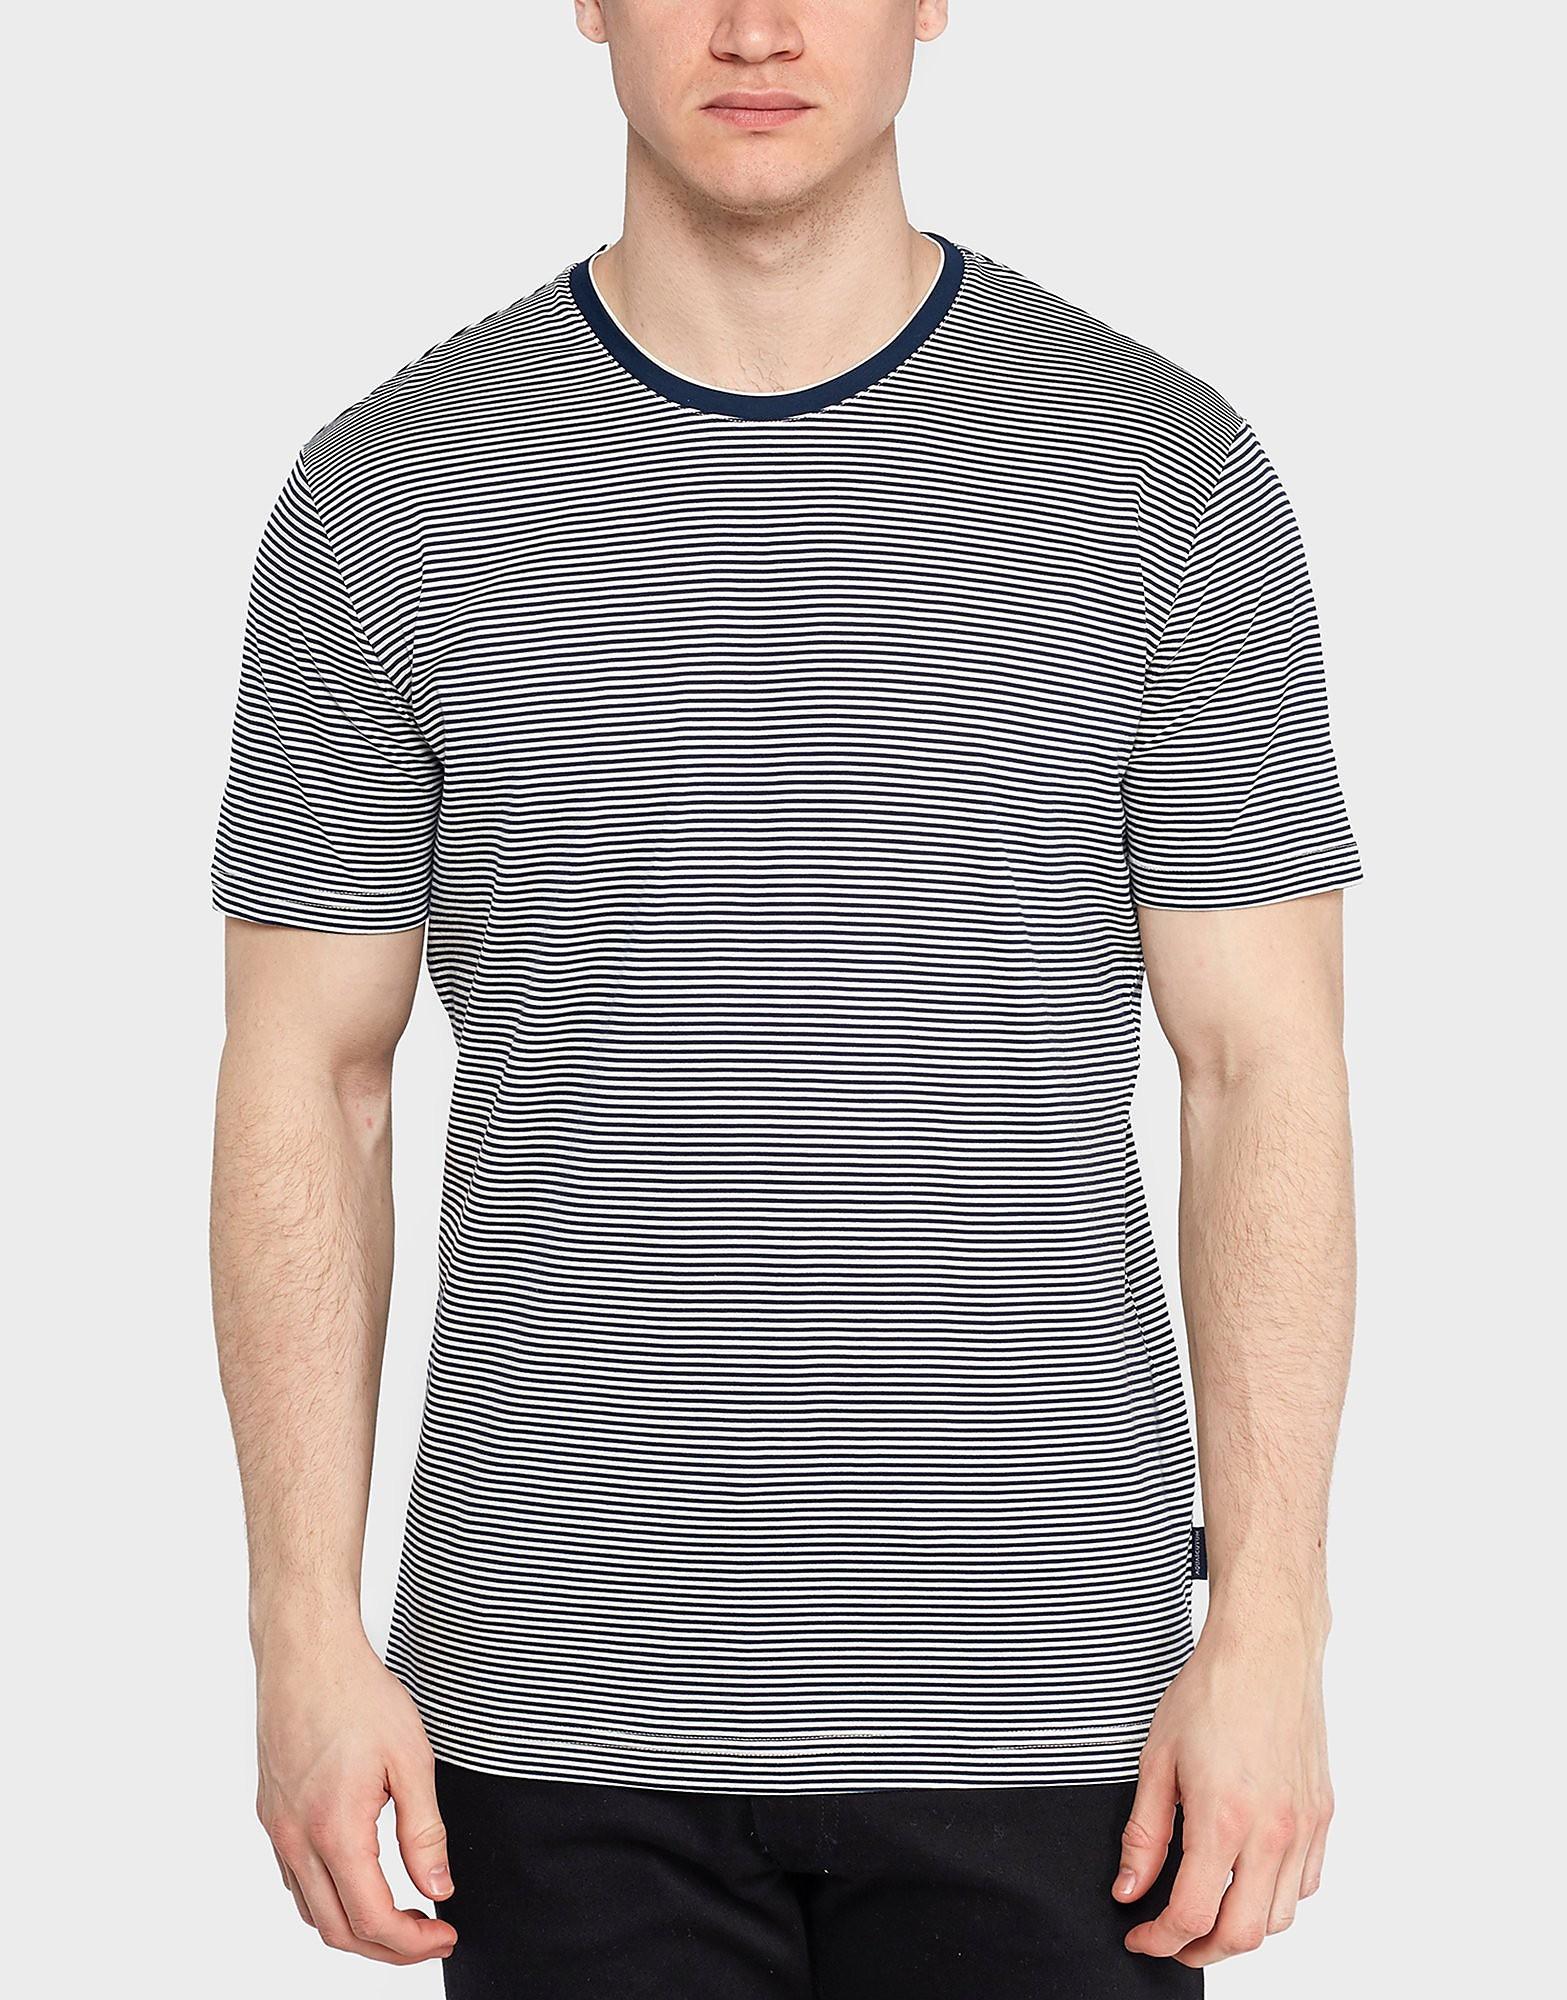 Aquascutum Tyson Stripe T-Shirt